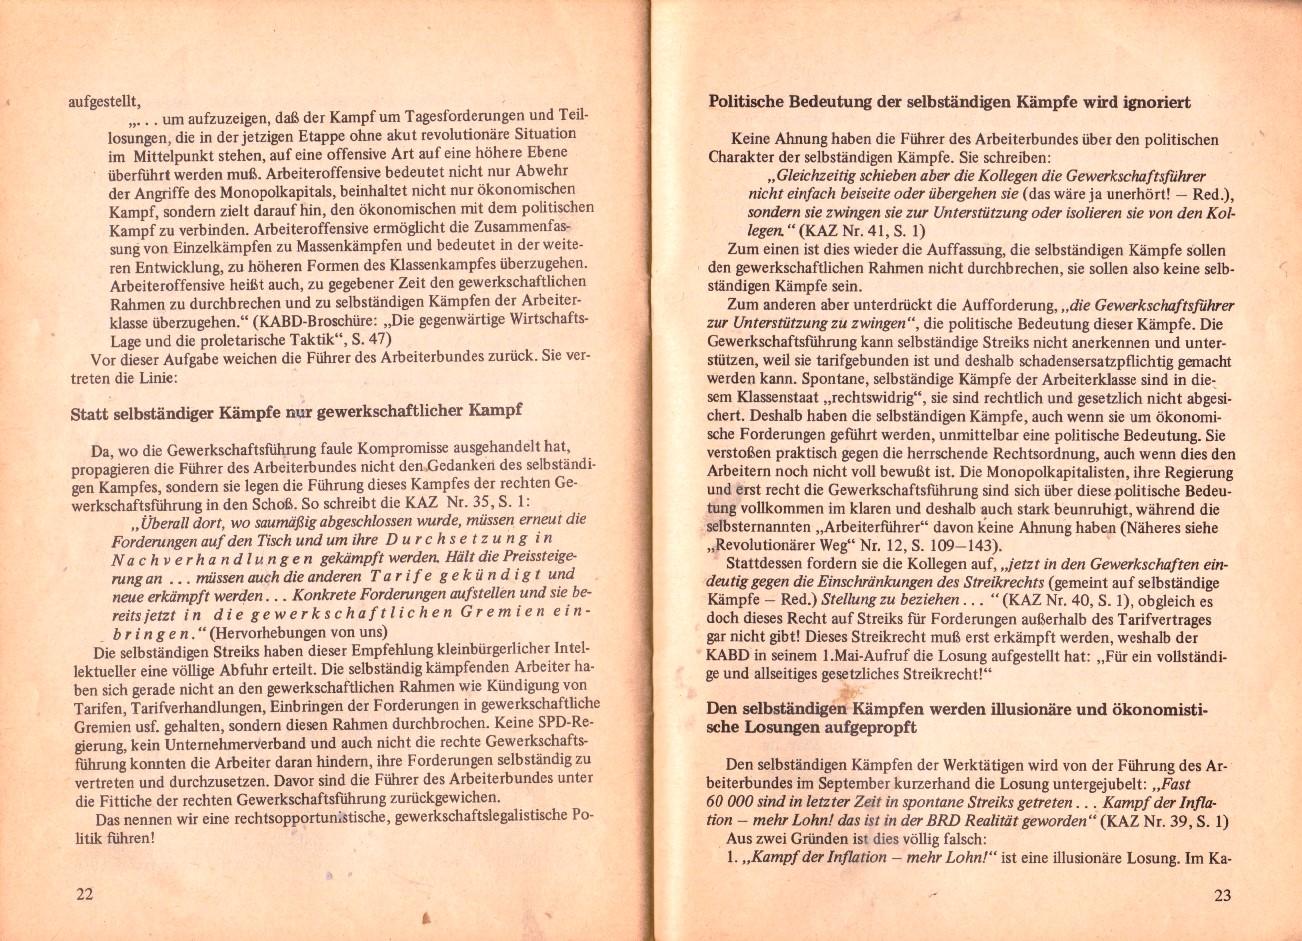 Muenchen_KABD_1974_Kritik_des_AB_13